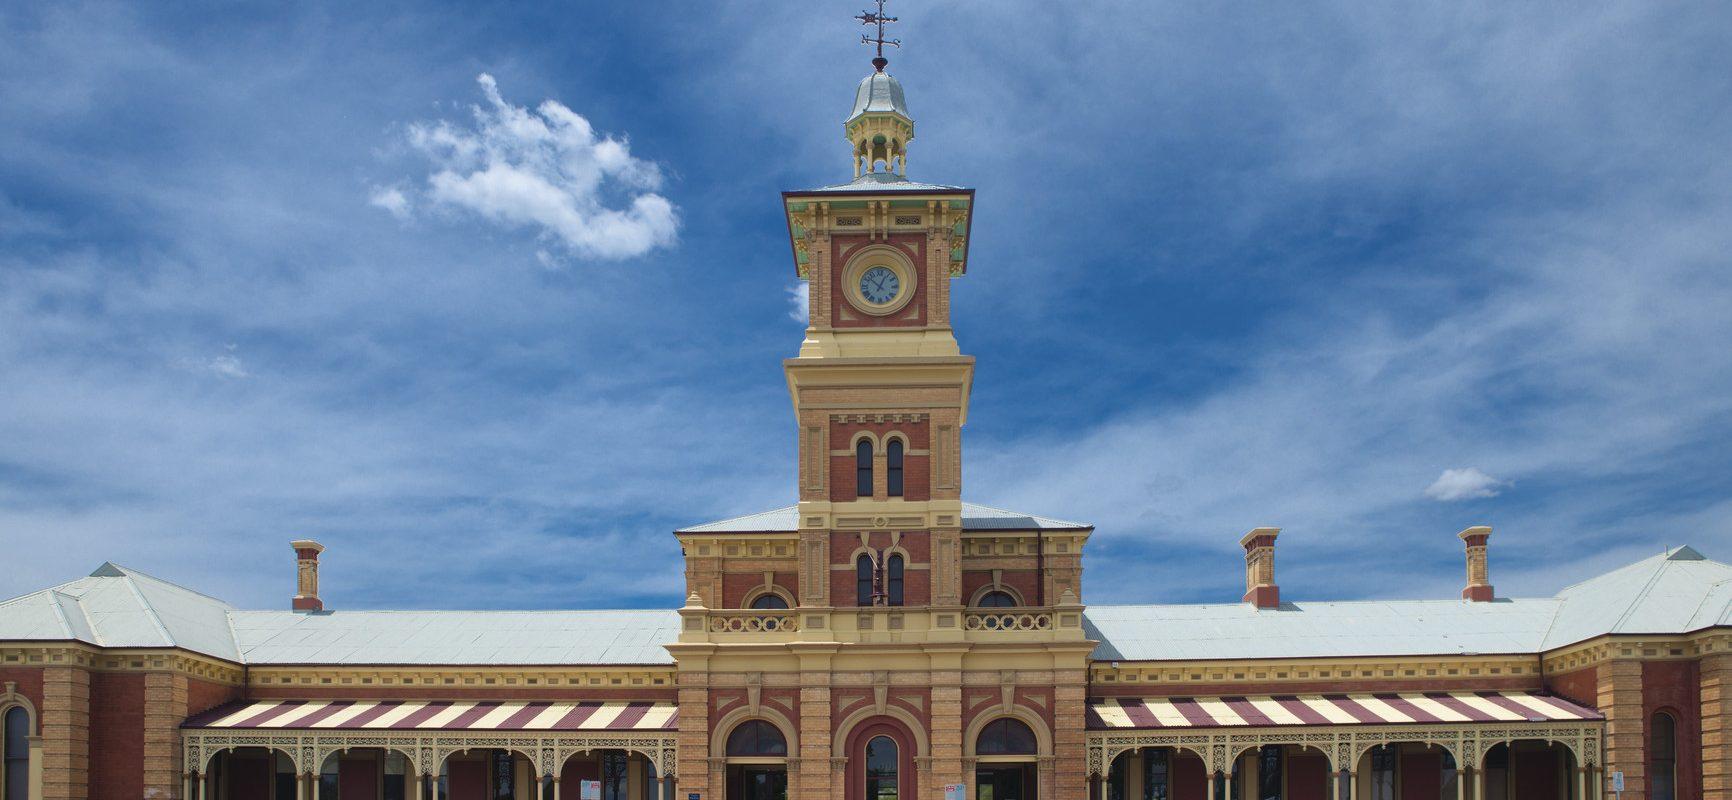 Albury historic Railway Station